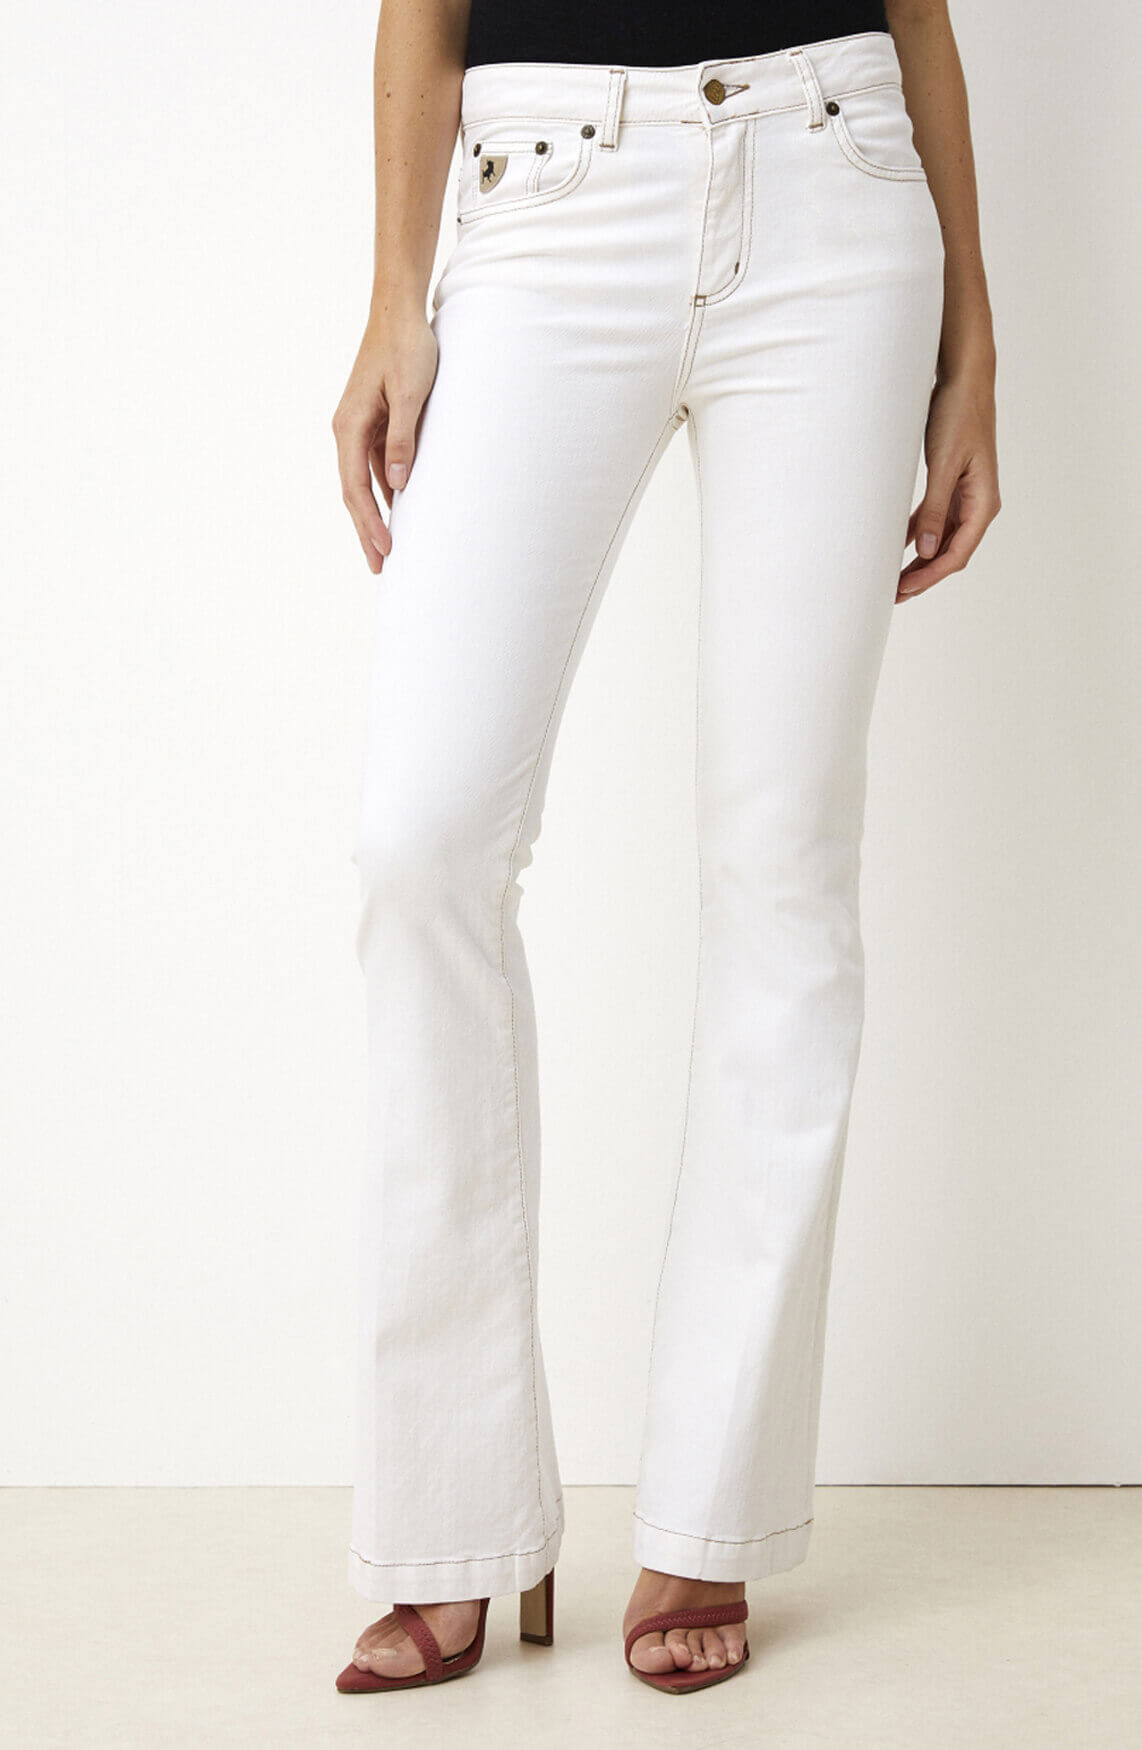 Lois Dames L32 Cheers Chic jeans Ecru